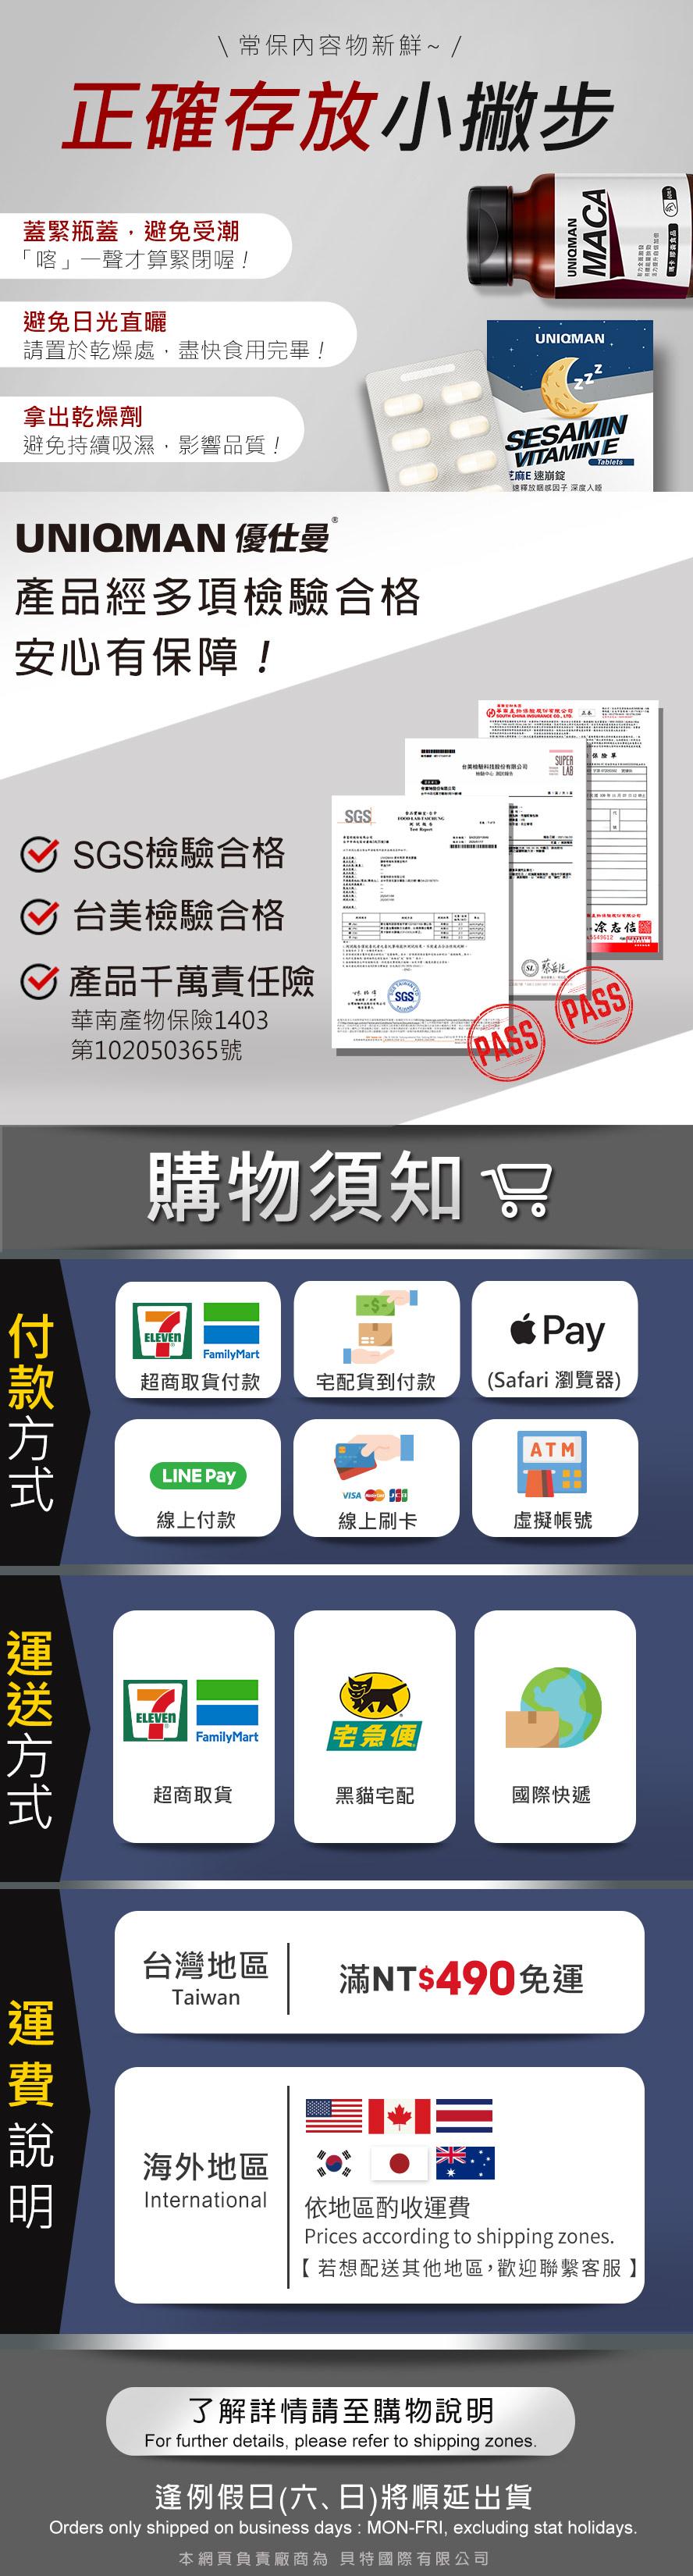 UNIQMAN是台灣第一的男性保健食品品牌